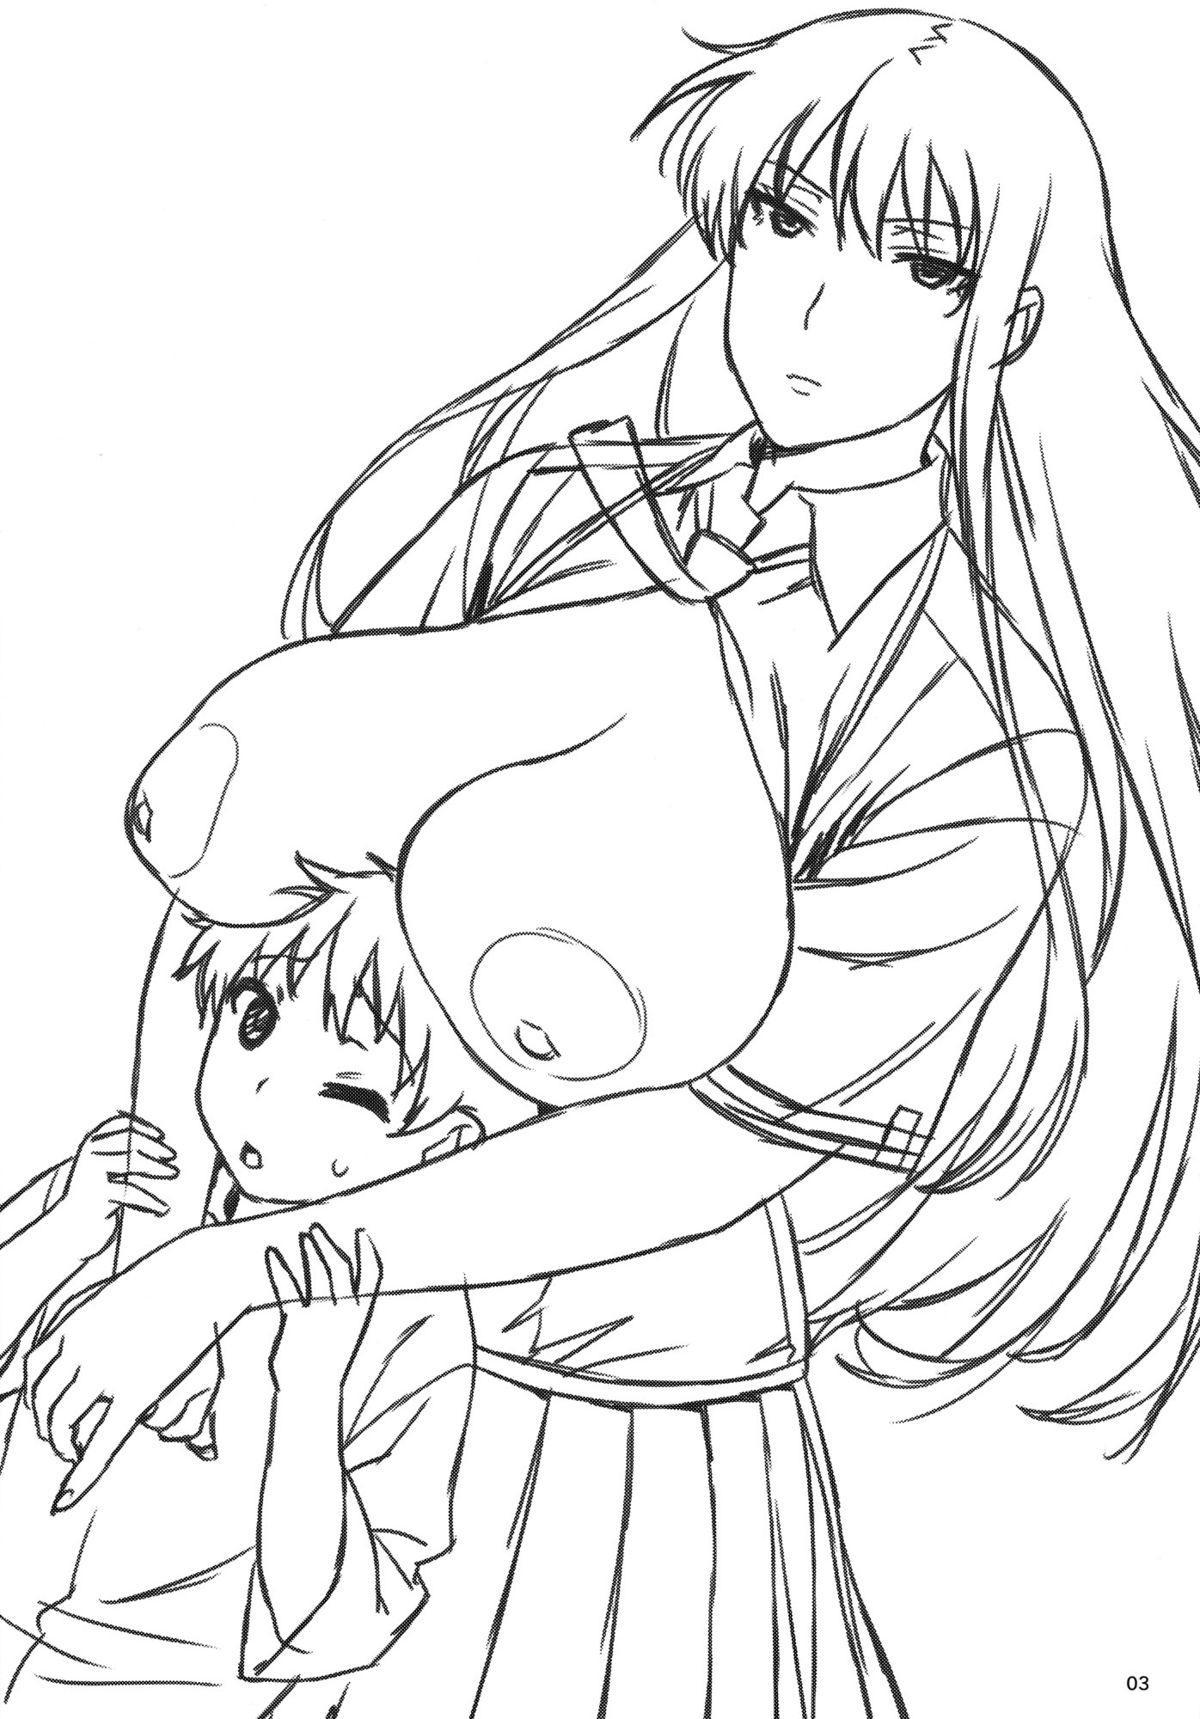 (C84) [666protect (Jingrock)] Doushichattano? Kagari-san | What Did I Do, Kagari-san? (Witch Craft Works) [English] {doujin-moe.us} 1